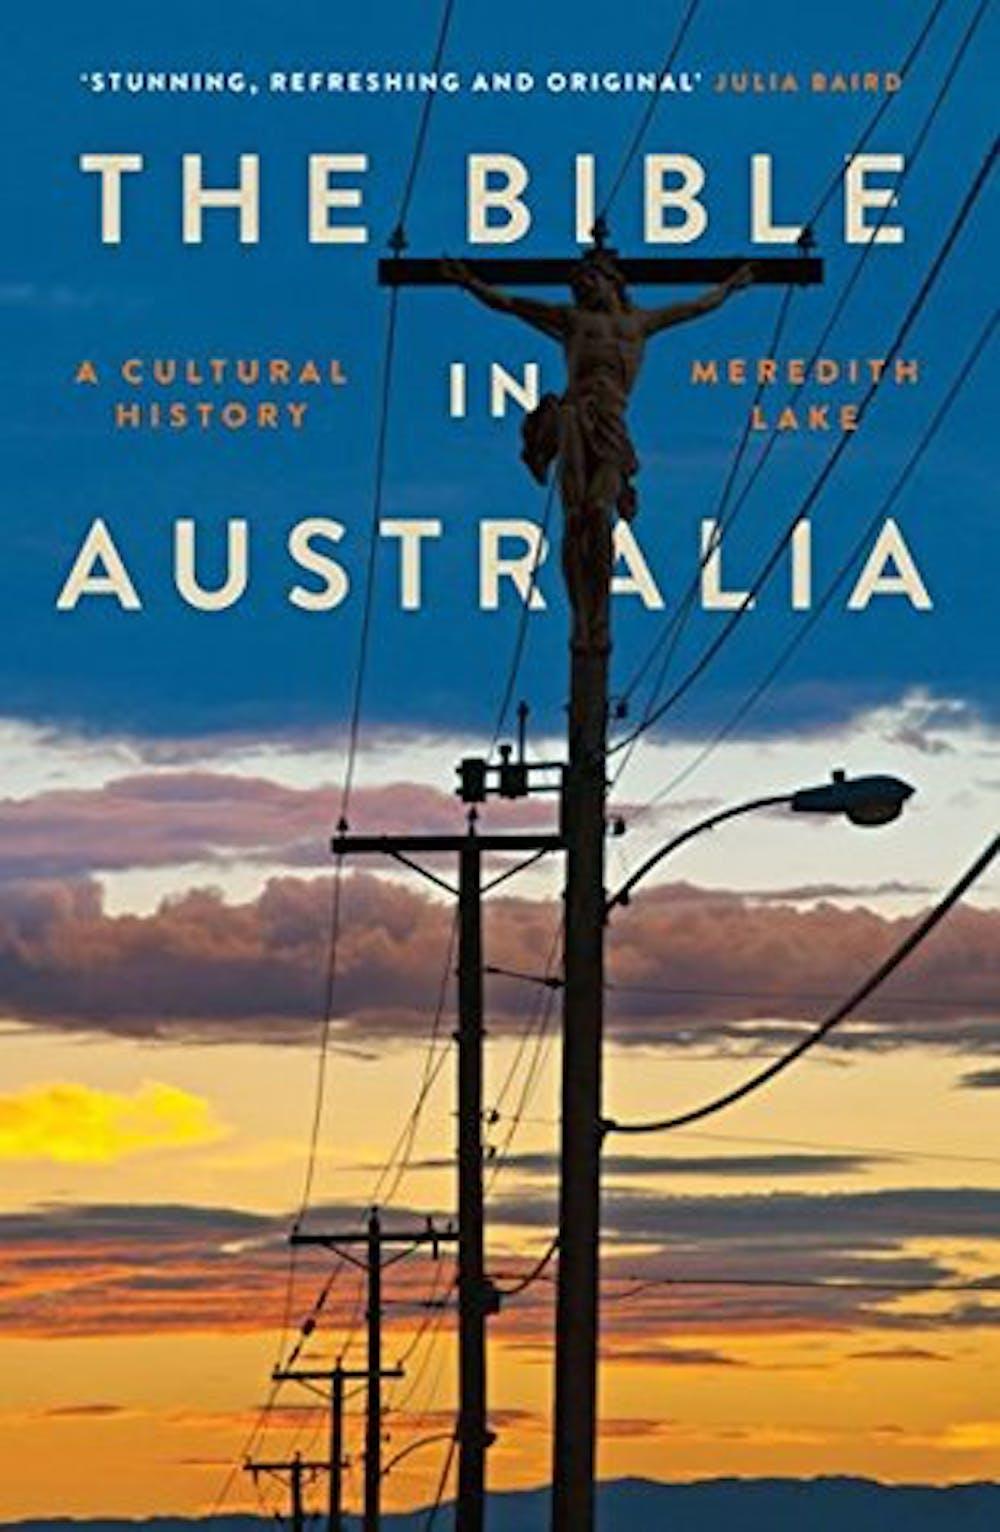 How the Bible helped shape Australian culture